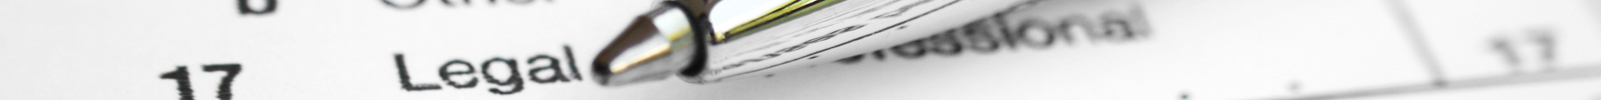 ACCA Fundamentals Revision Notes